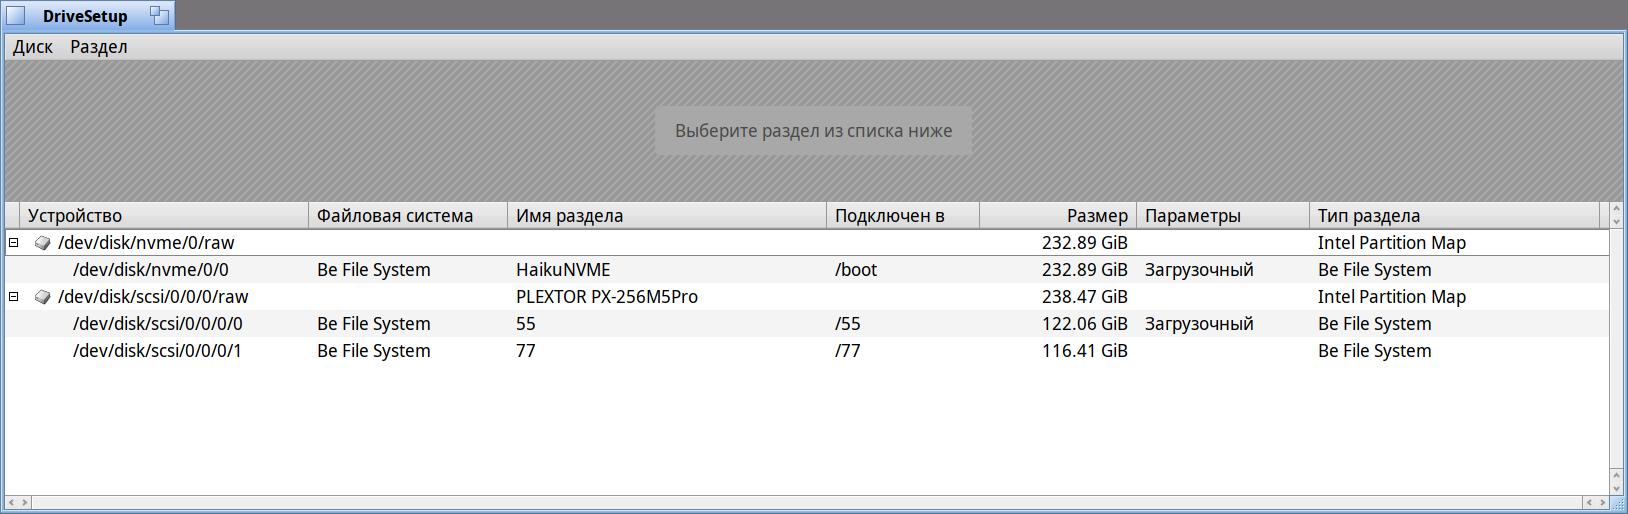 screenshot529